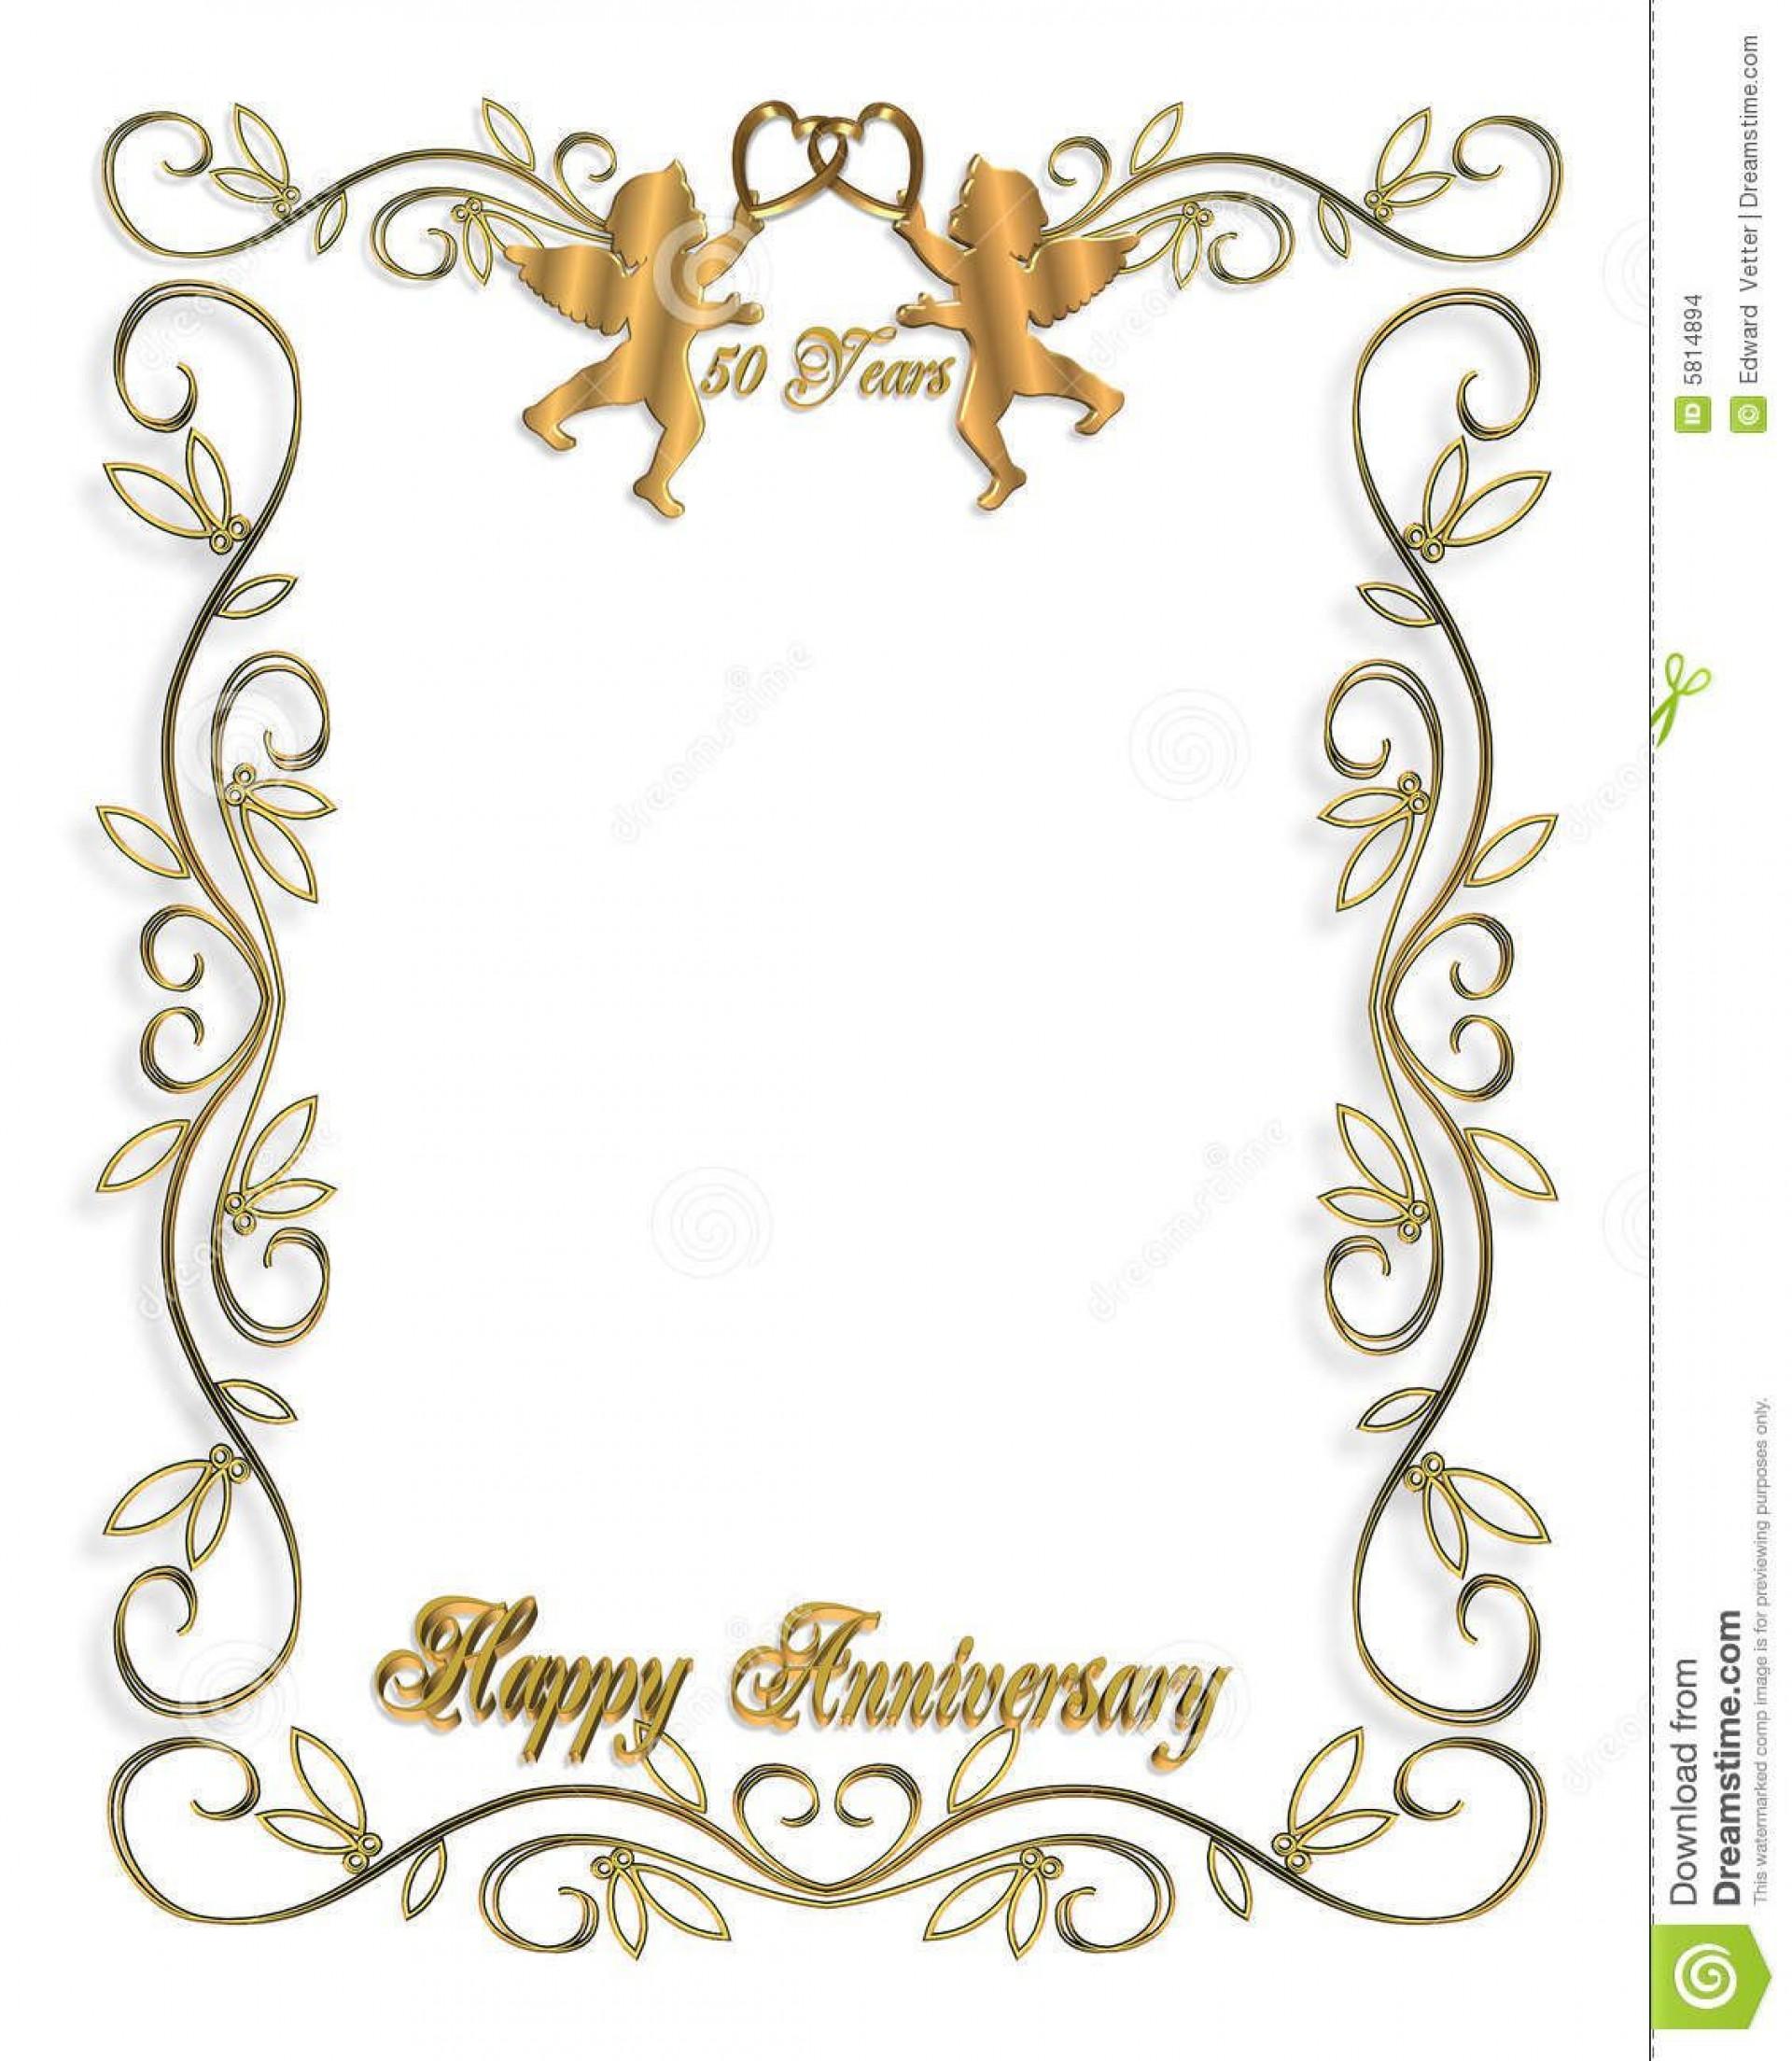 010 Imposing 50th Wedding Anniversary Invitation Template High Resolution  Templates Card Sample Golden1920